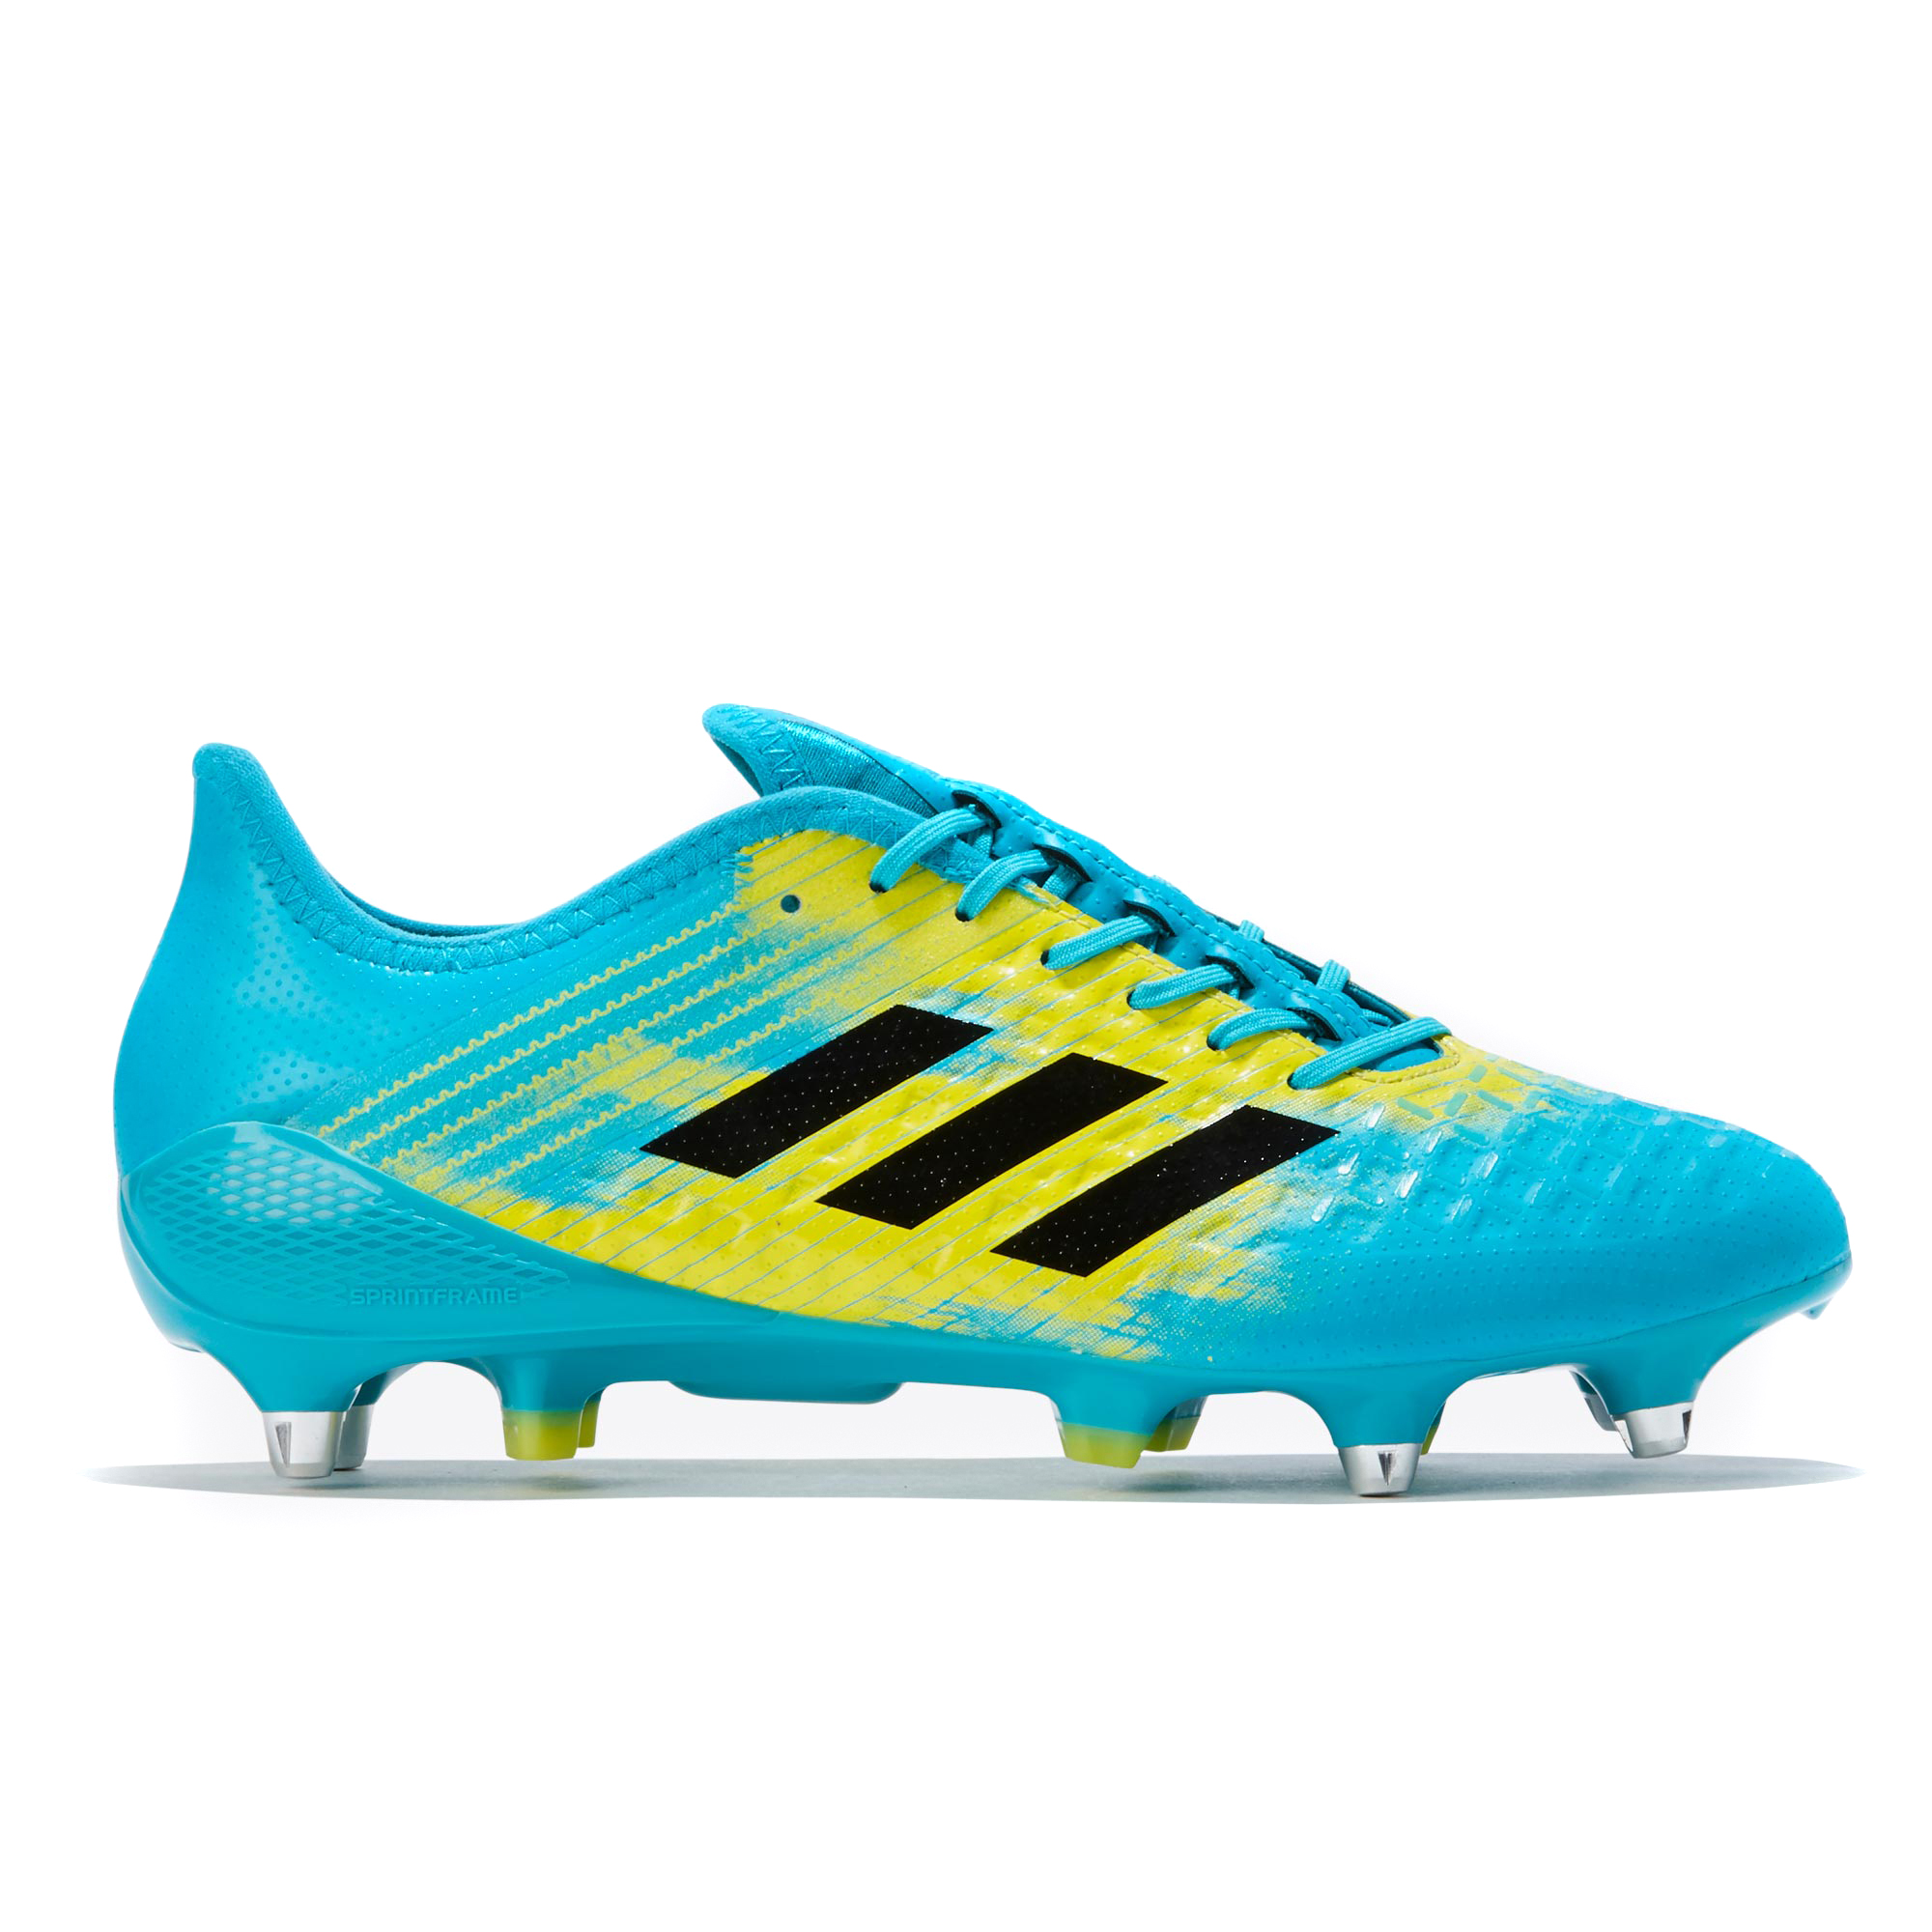 "Image of ""adidas Predator Malice Control - Soft Ground Rugby Boot - Aqua/Black/Yellow"""